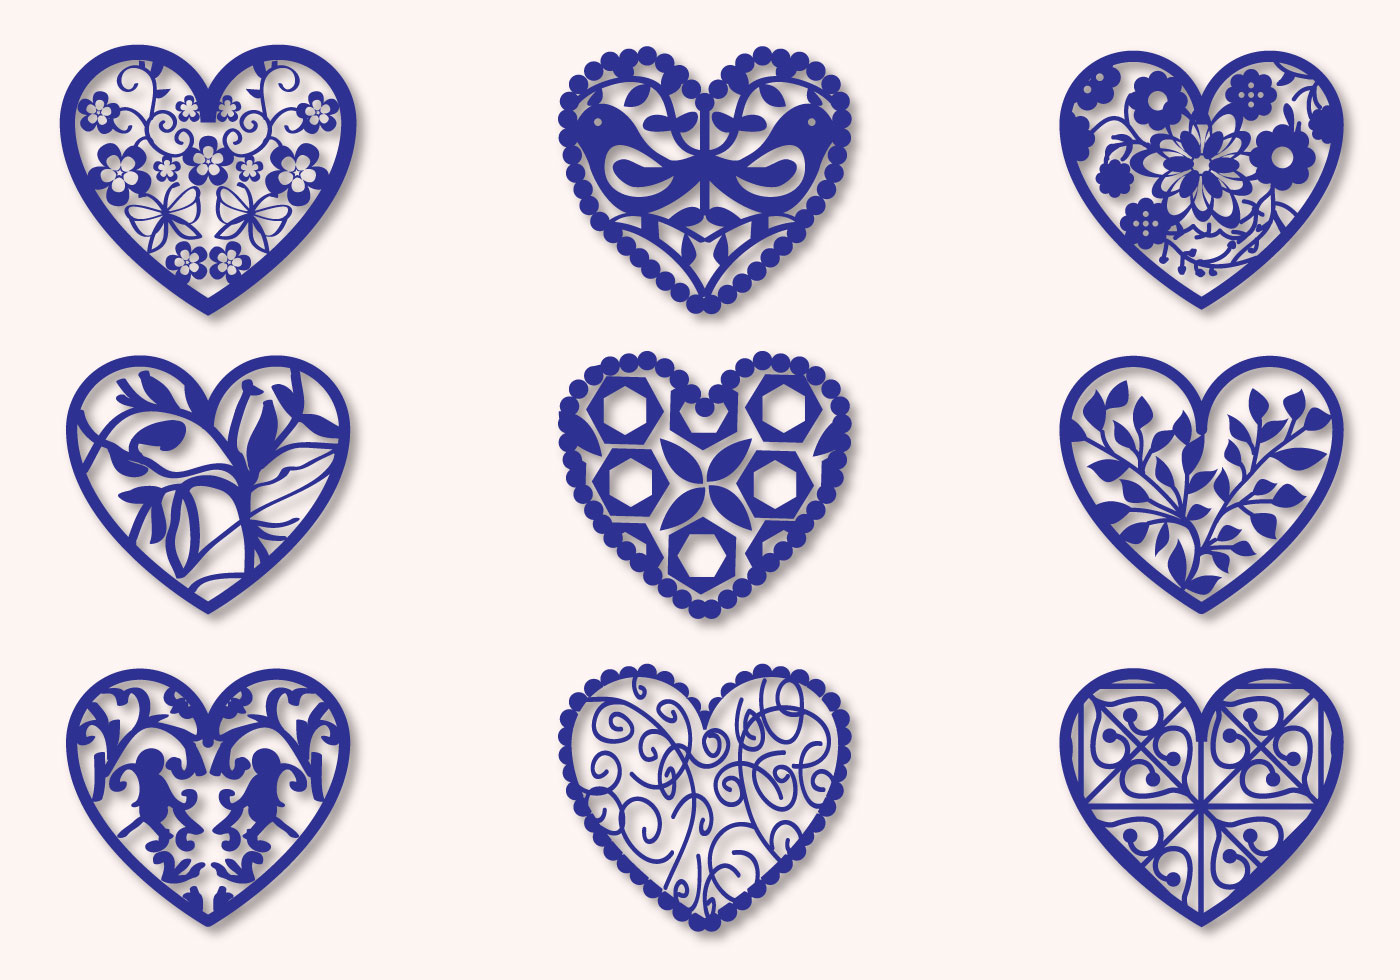 Fretwork Heart Vectors - Download Free Vector Art, Stock ...